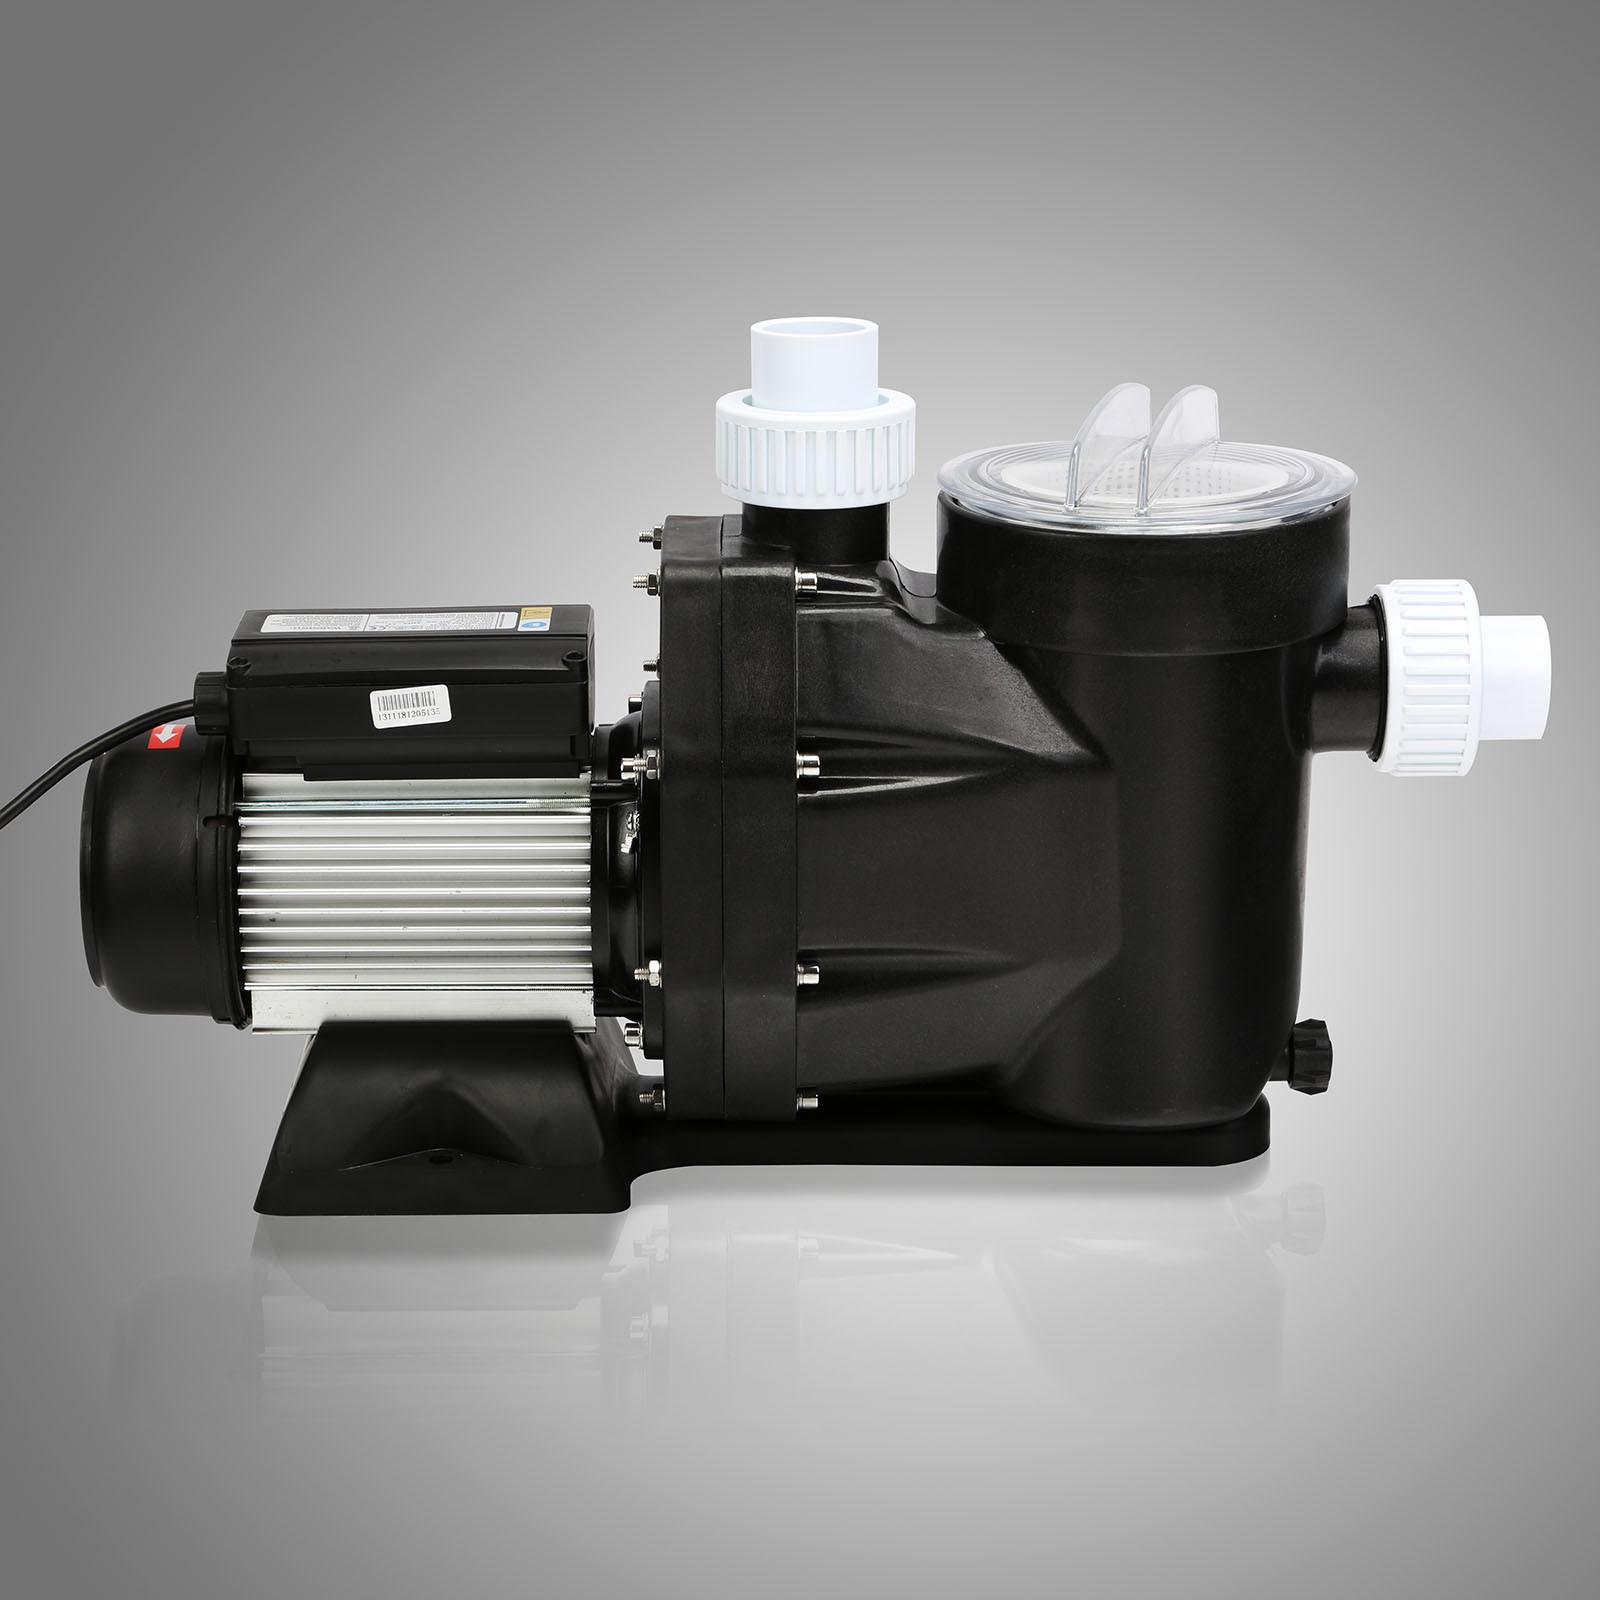 2 5hp pool pump motor above ground swimming pool filter hi - Most energy efficient swimming pool pump ...